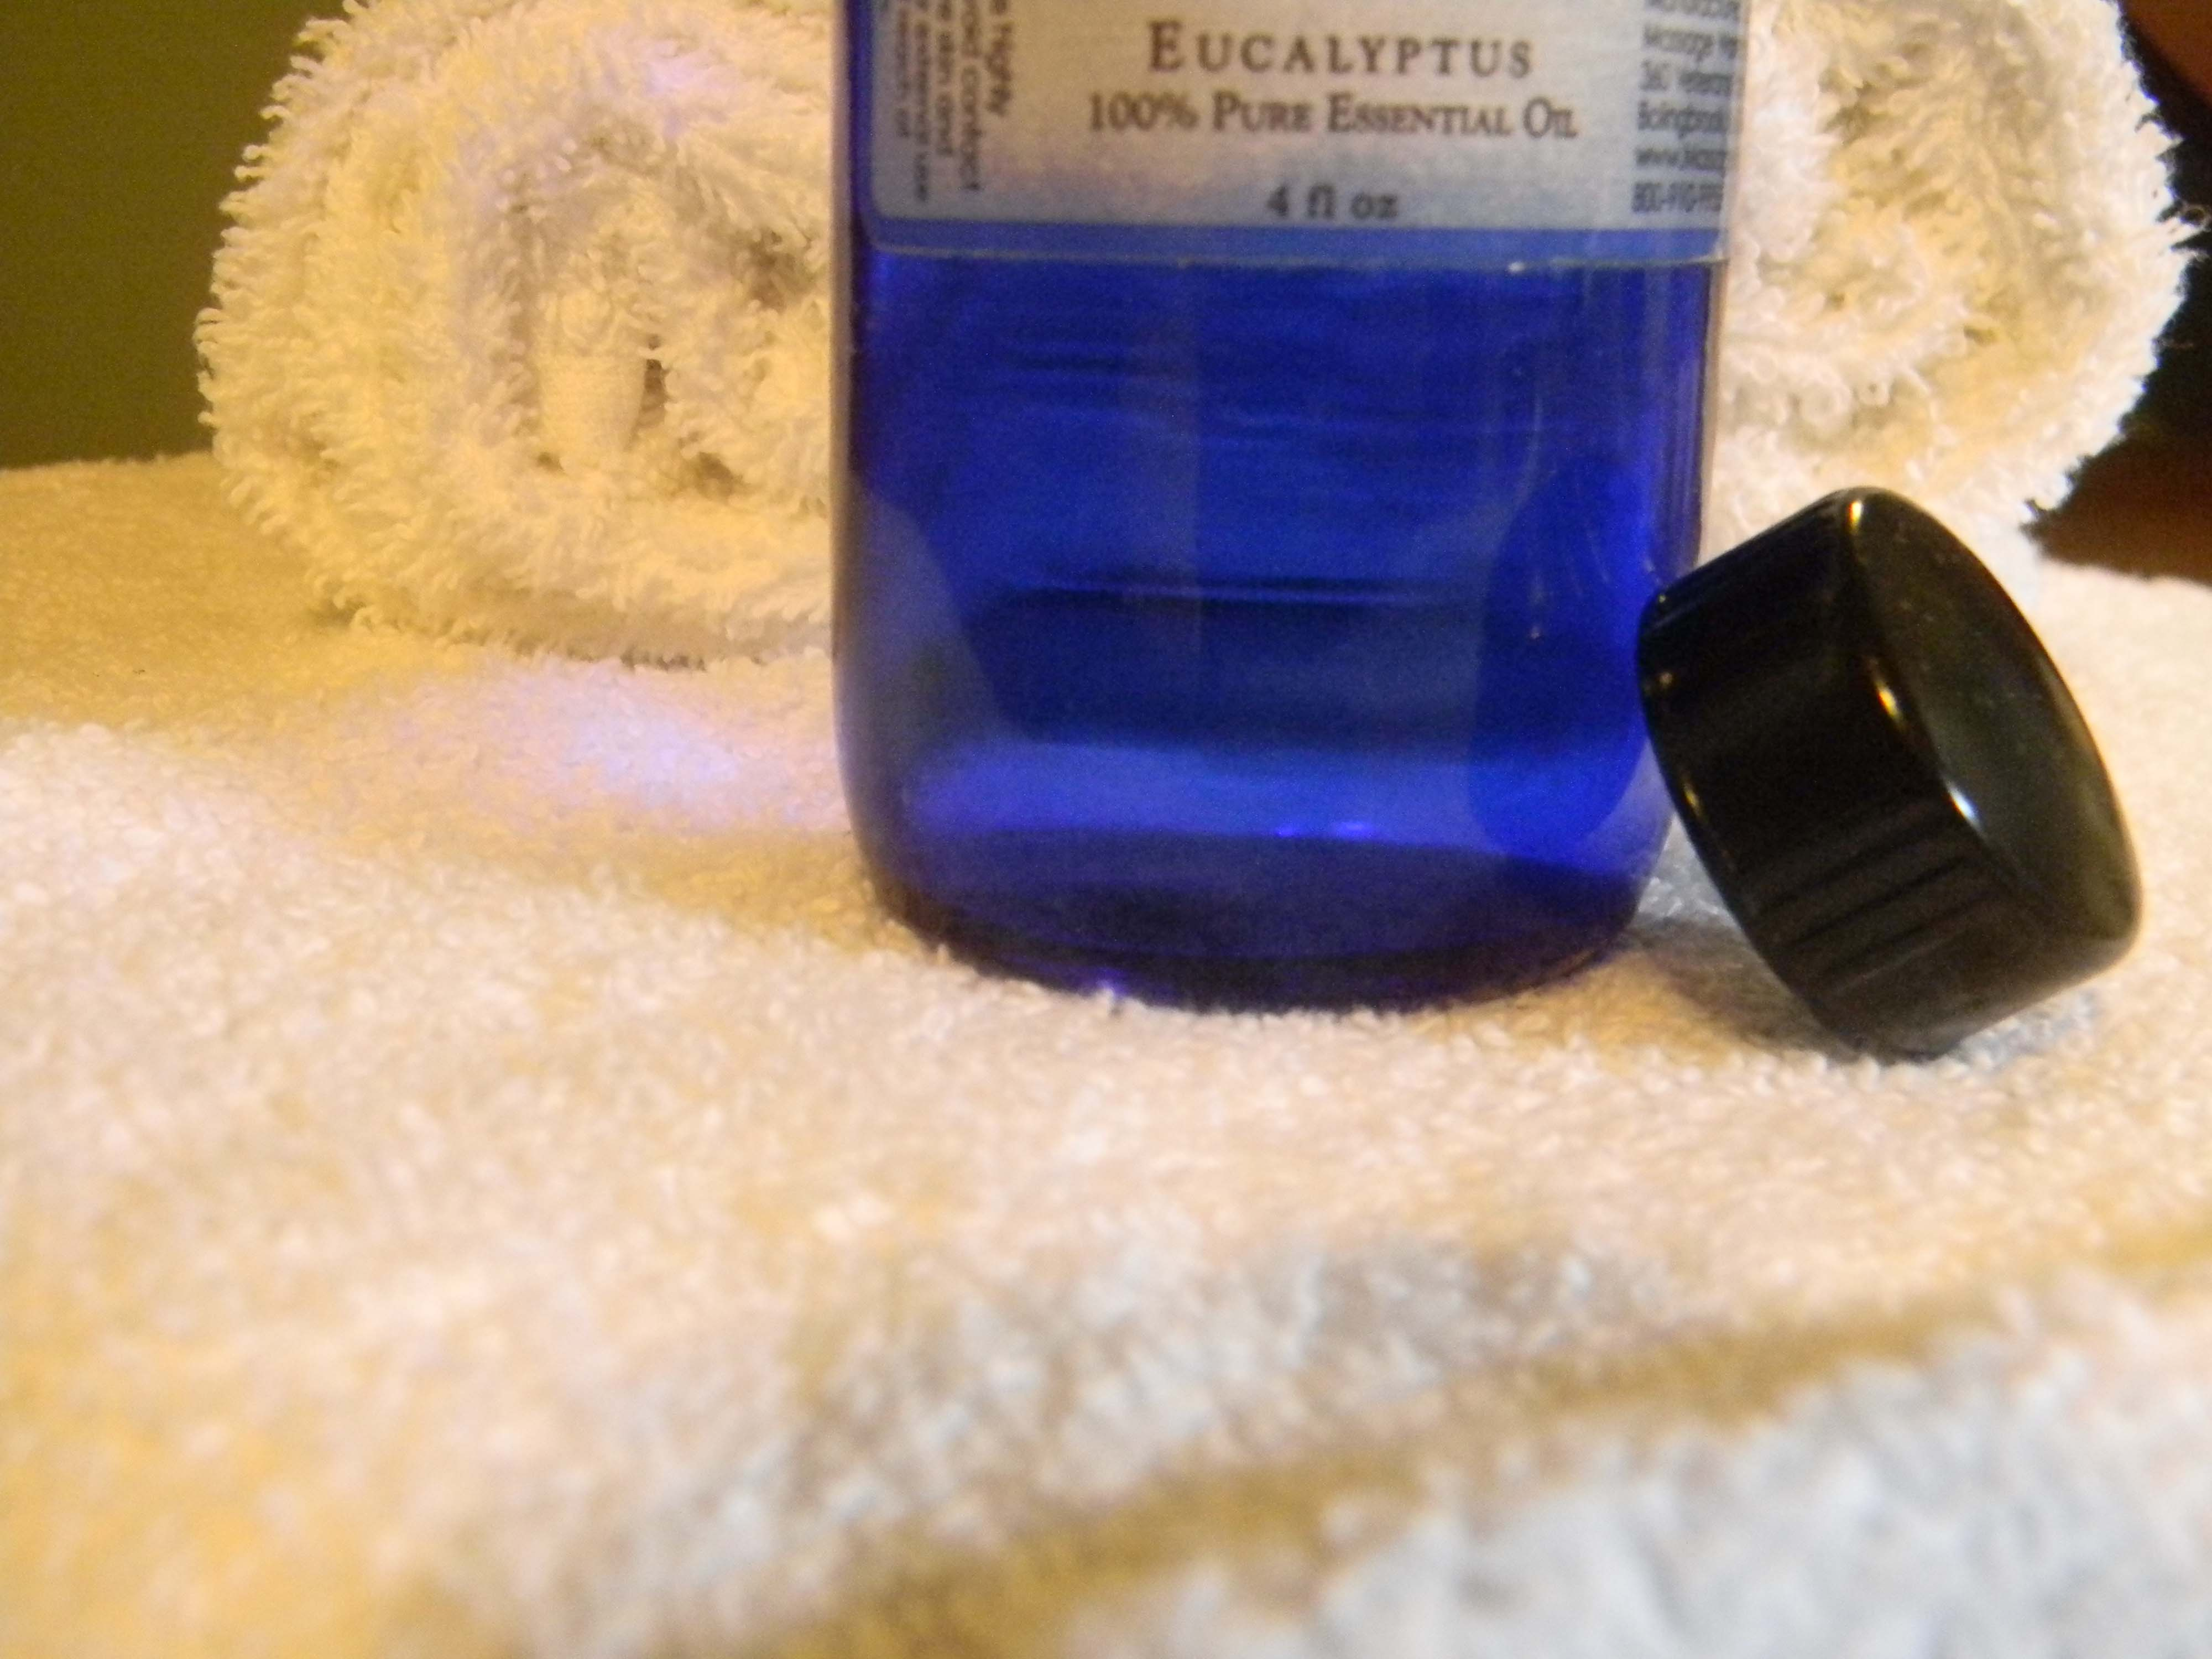 Benefits of Eucalyptus Oil!